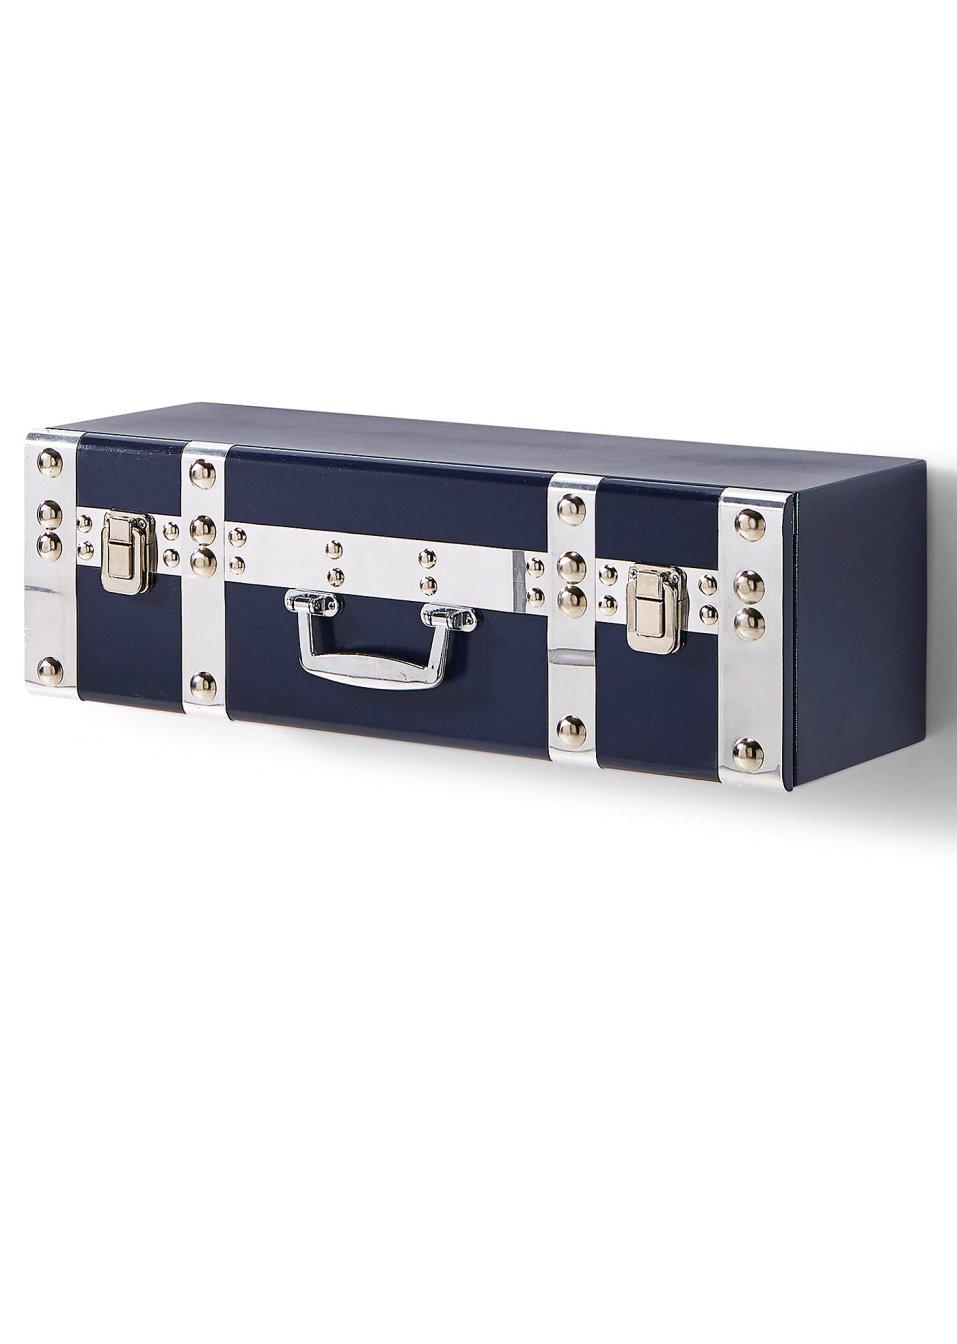 wandregal eve klein blau wohnen bpc living. Black Bedroom Furniture Sets. Home Design Ideas